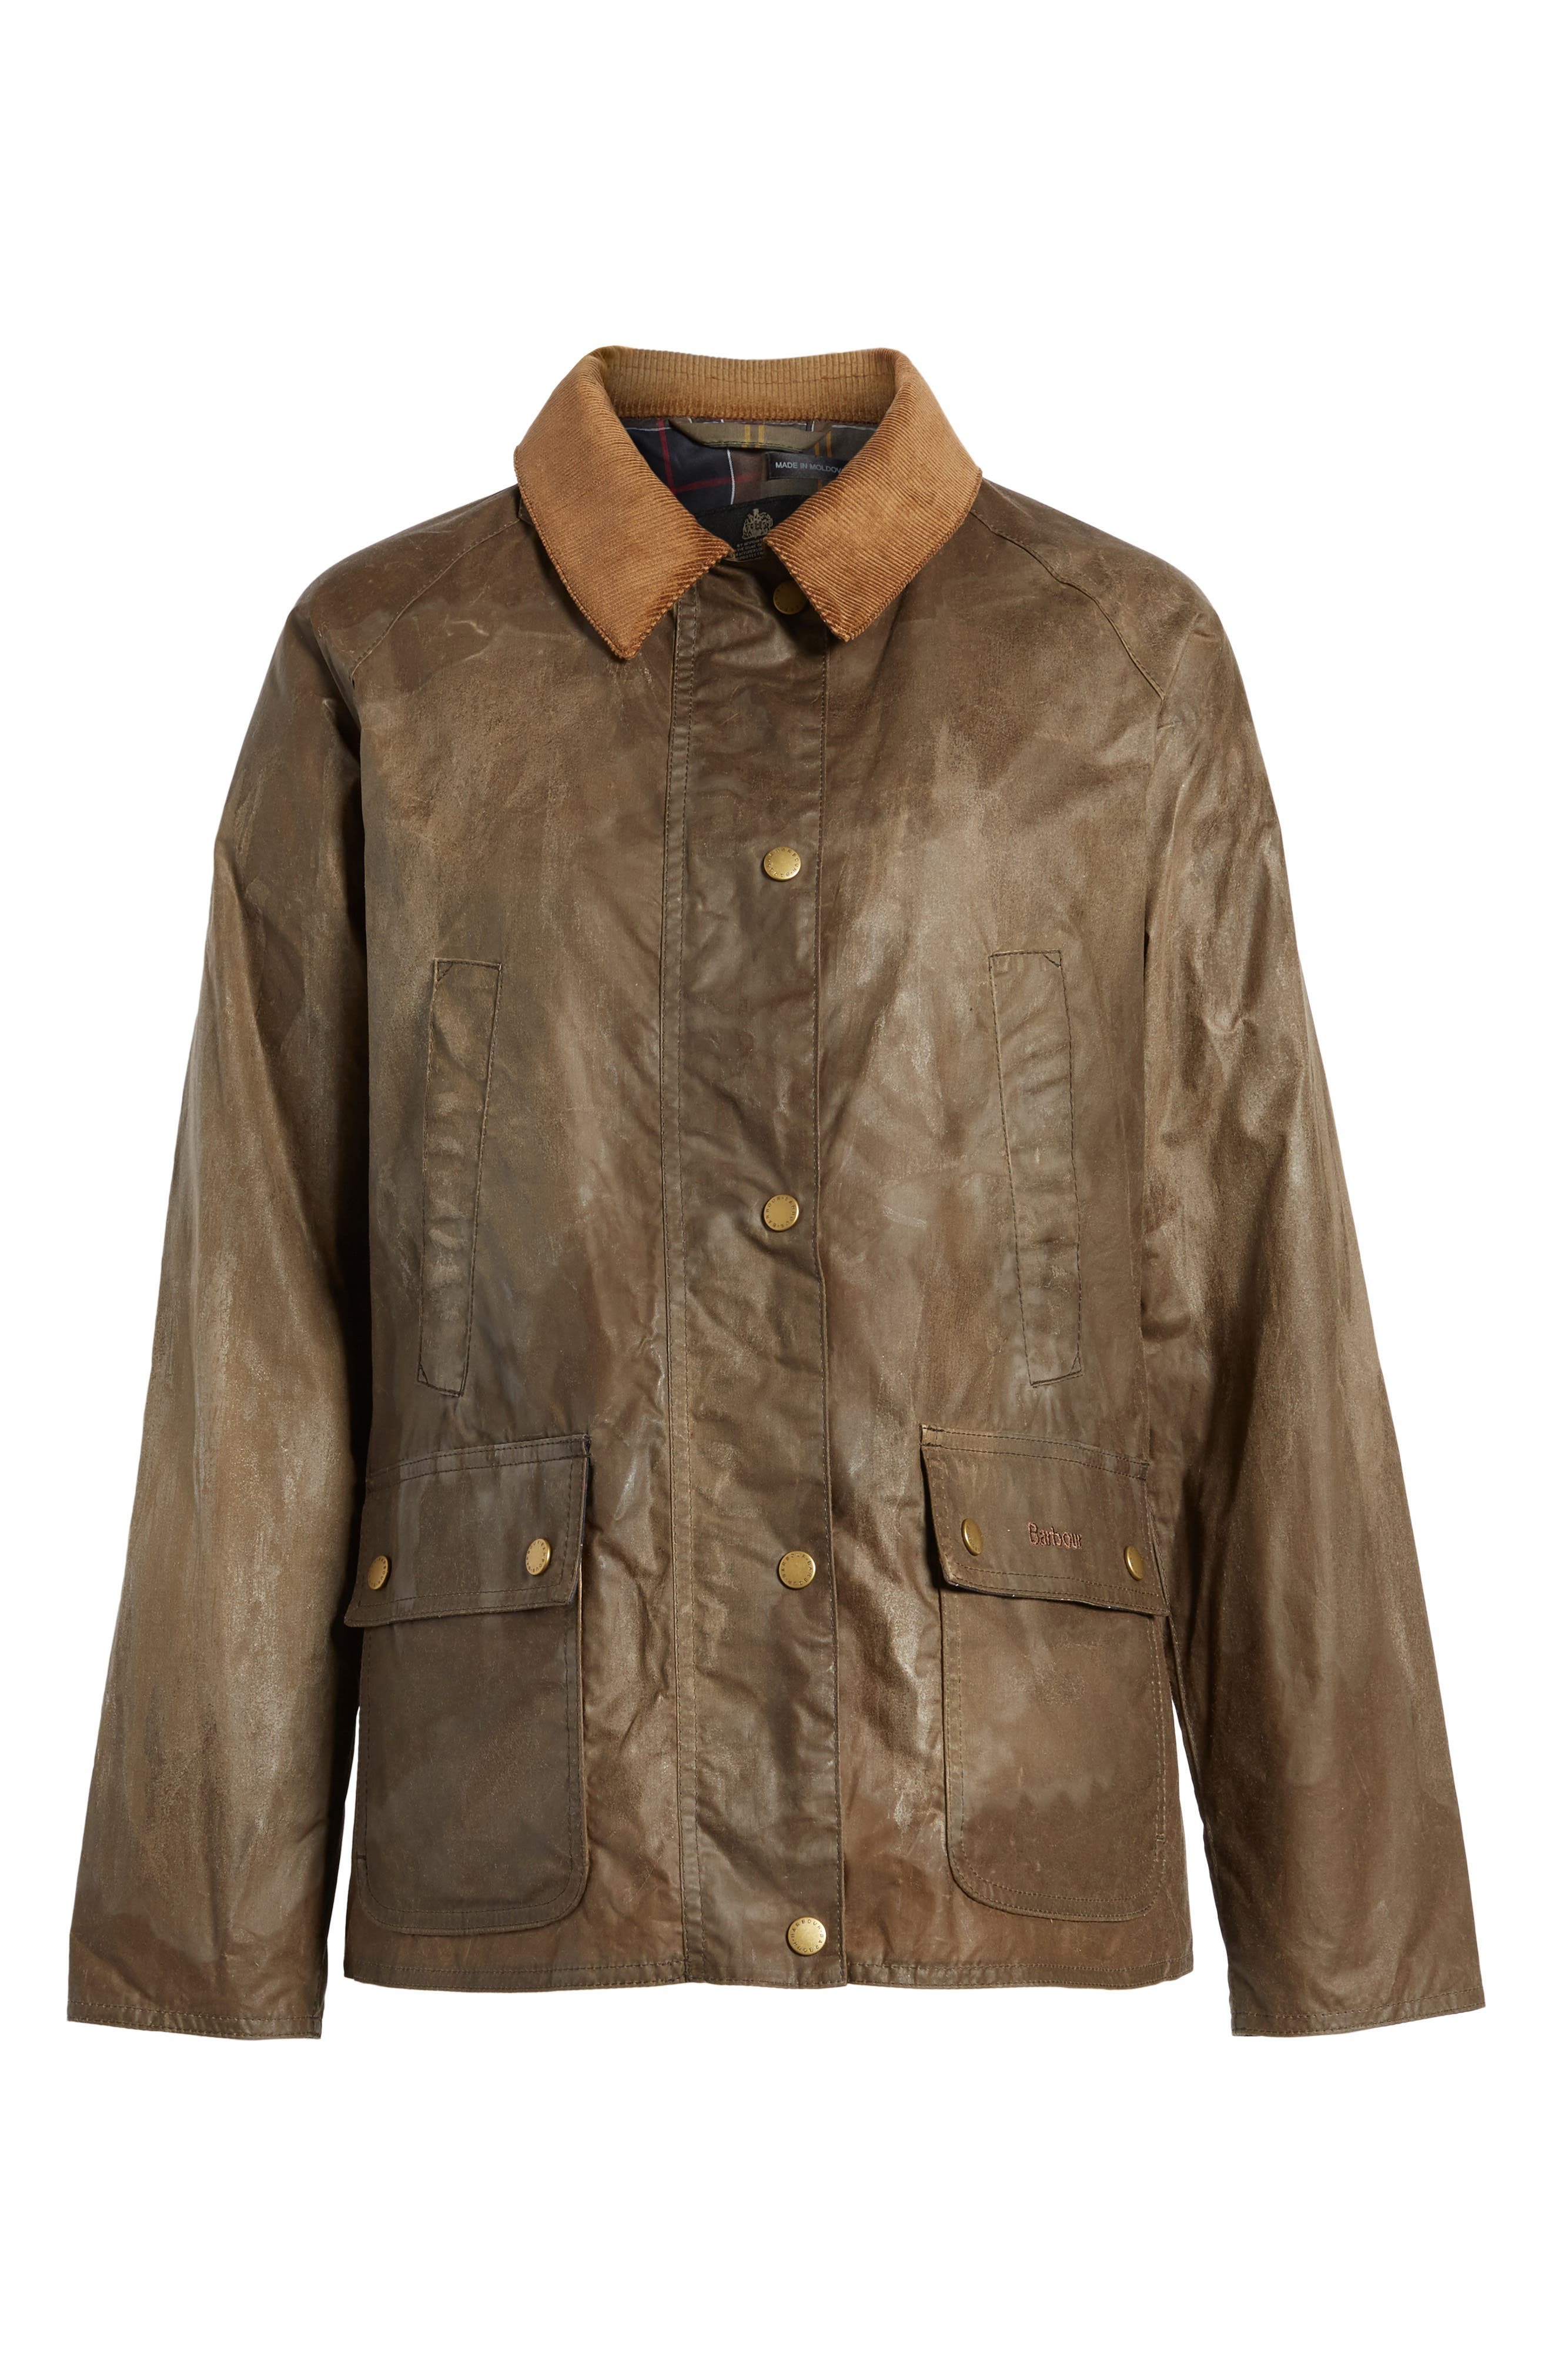 Acorn Water Resistant Waxed Cotton Jacket,                             Alternate thumbnail 6, color,                             230